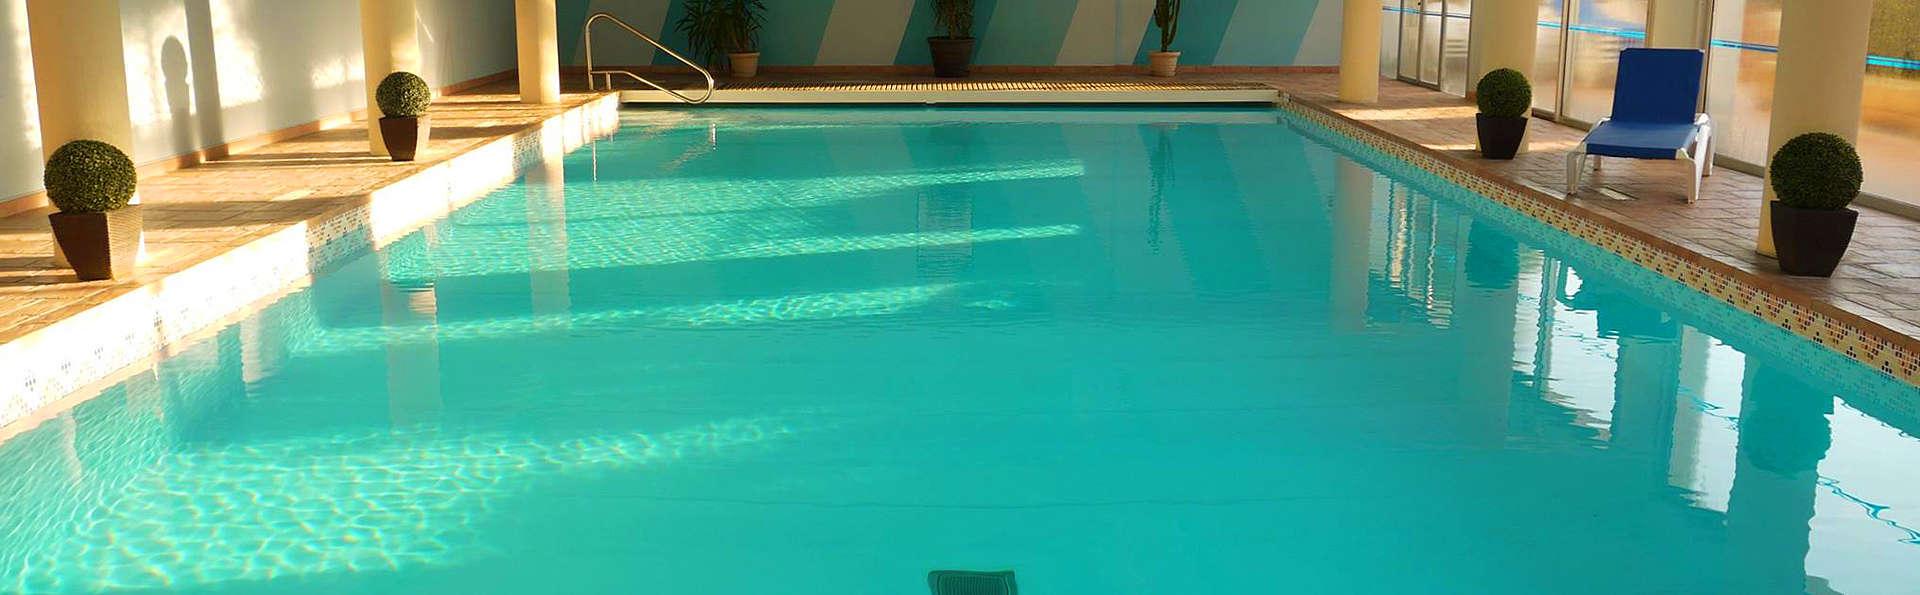 Hôtel Europa - Quiberon - EDIT_Pool.jpg